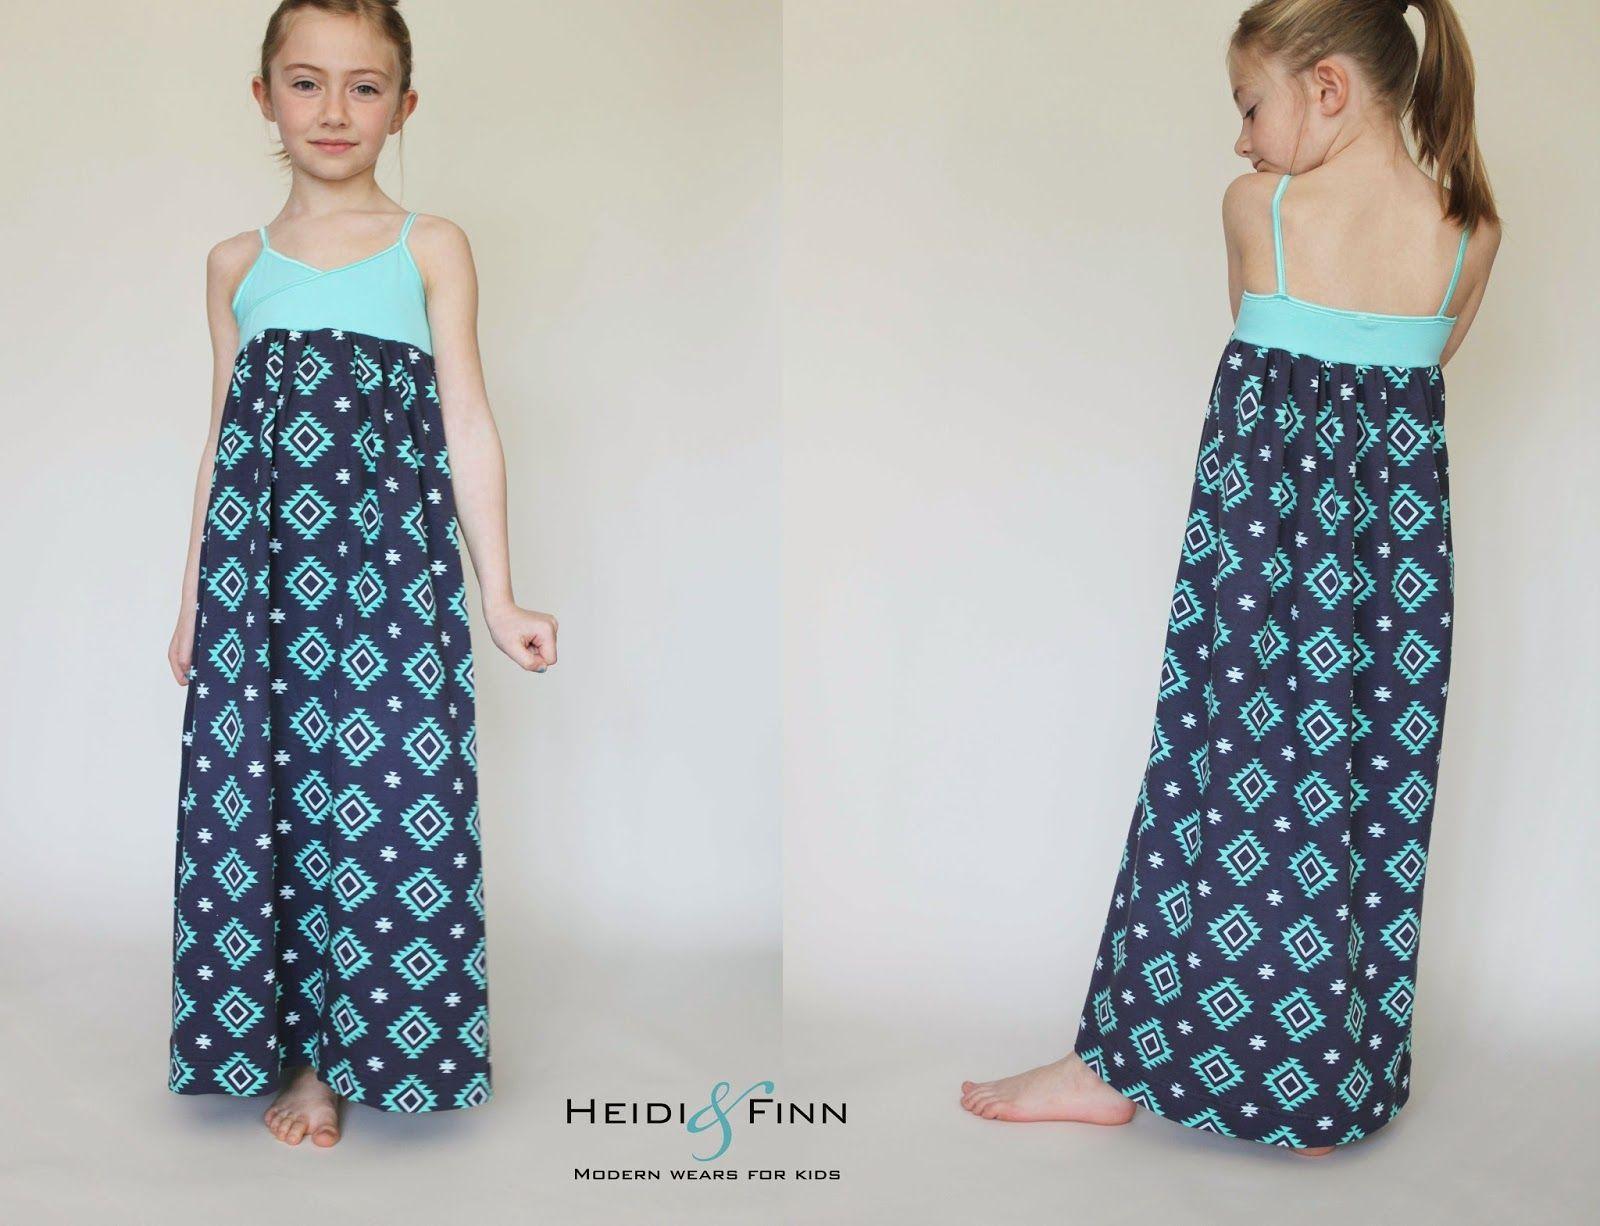 HeidiandFinn modern wears for kids: Riley Blake - Knit Love Tour + ...